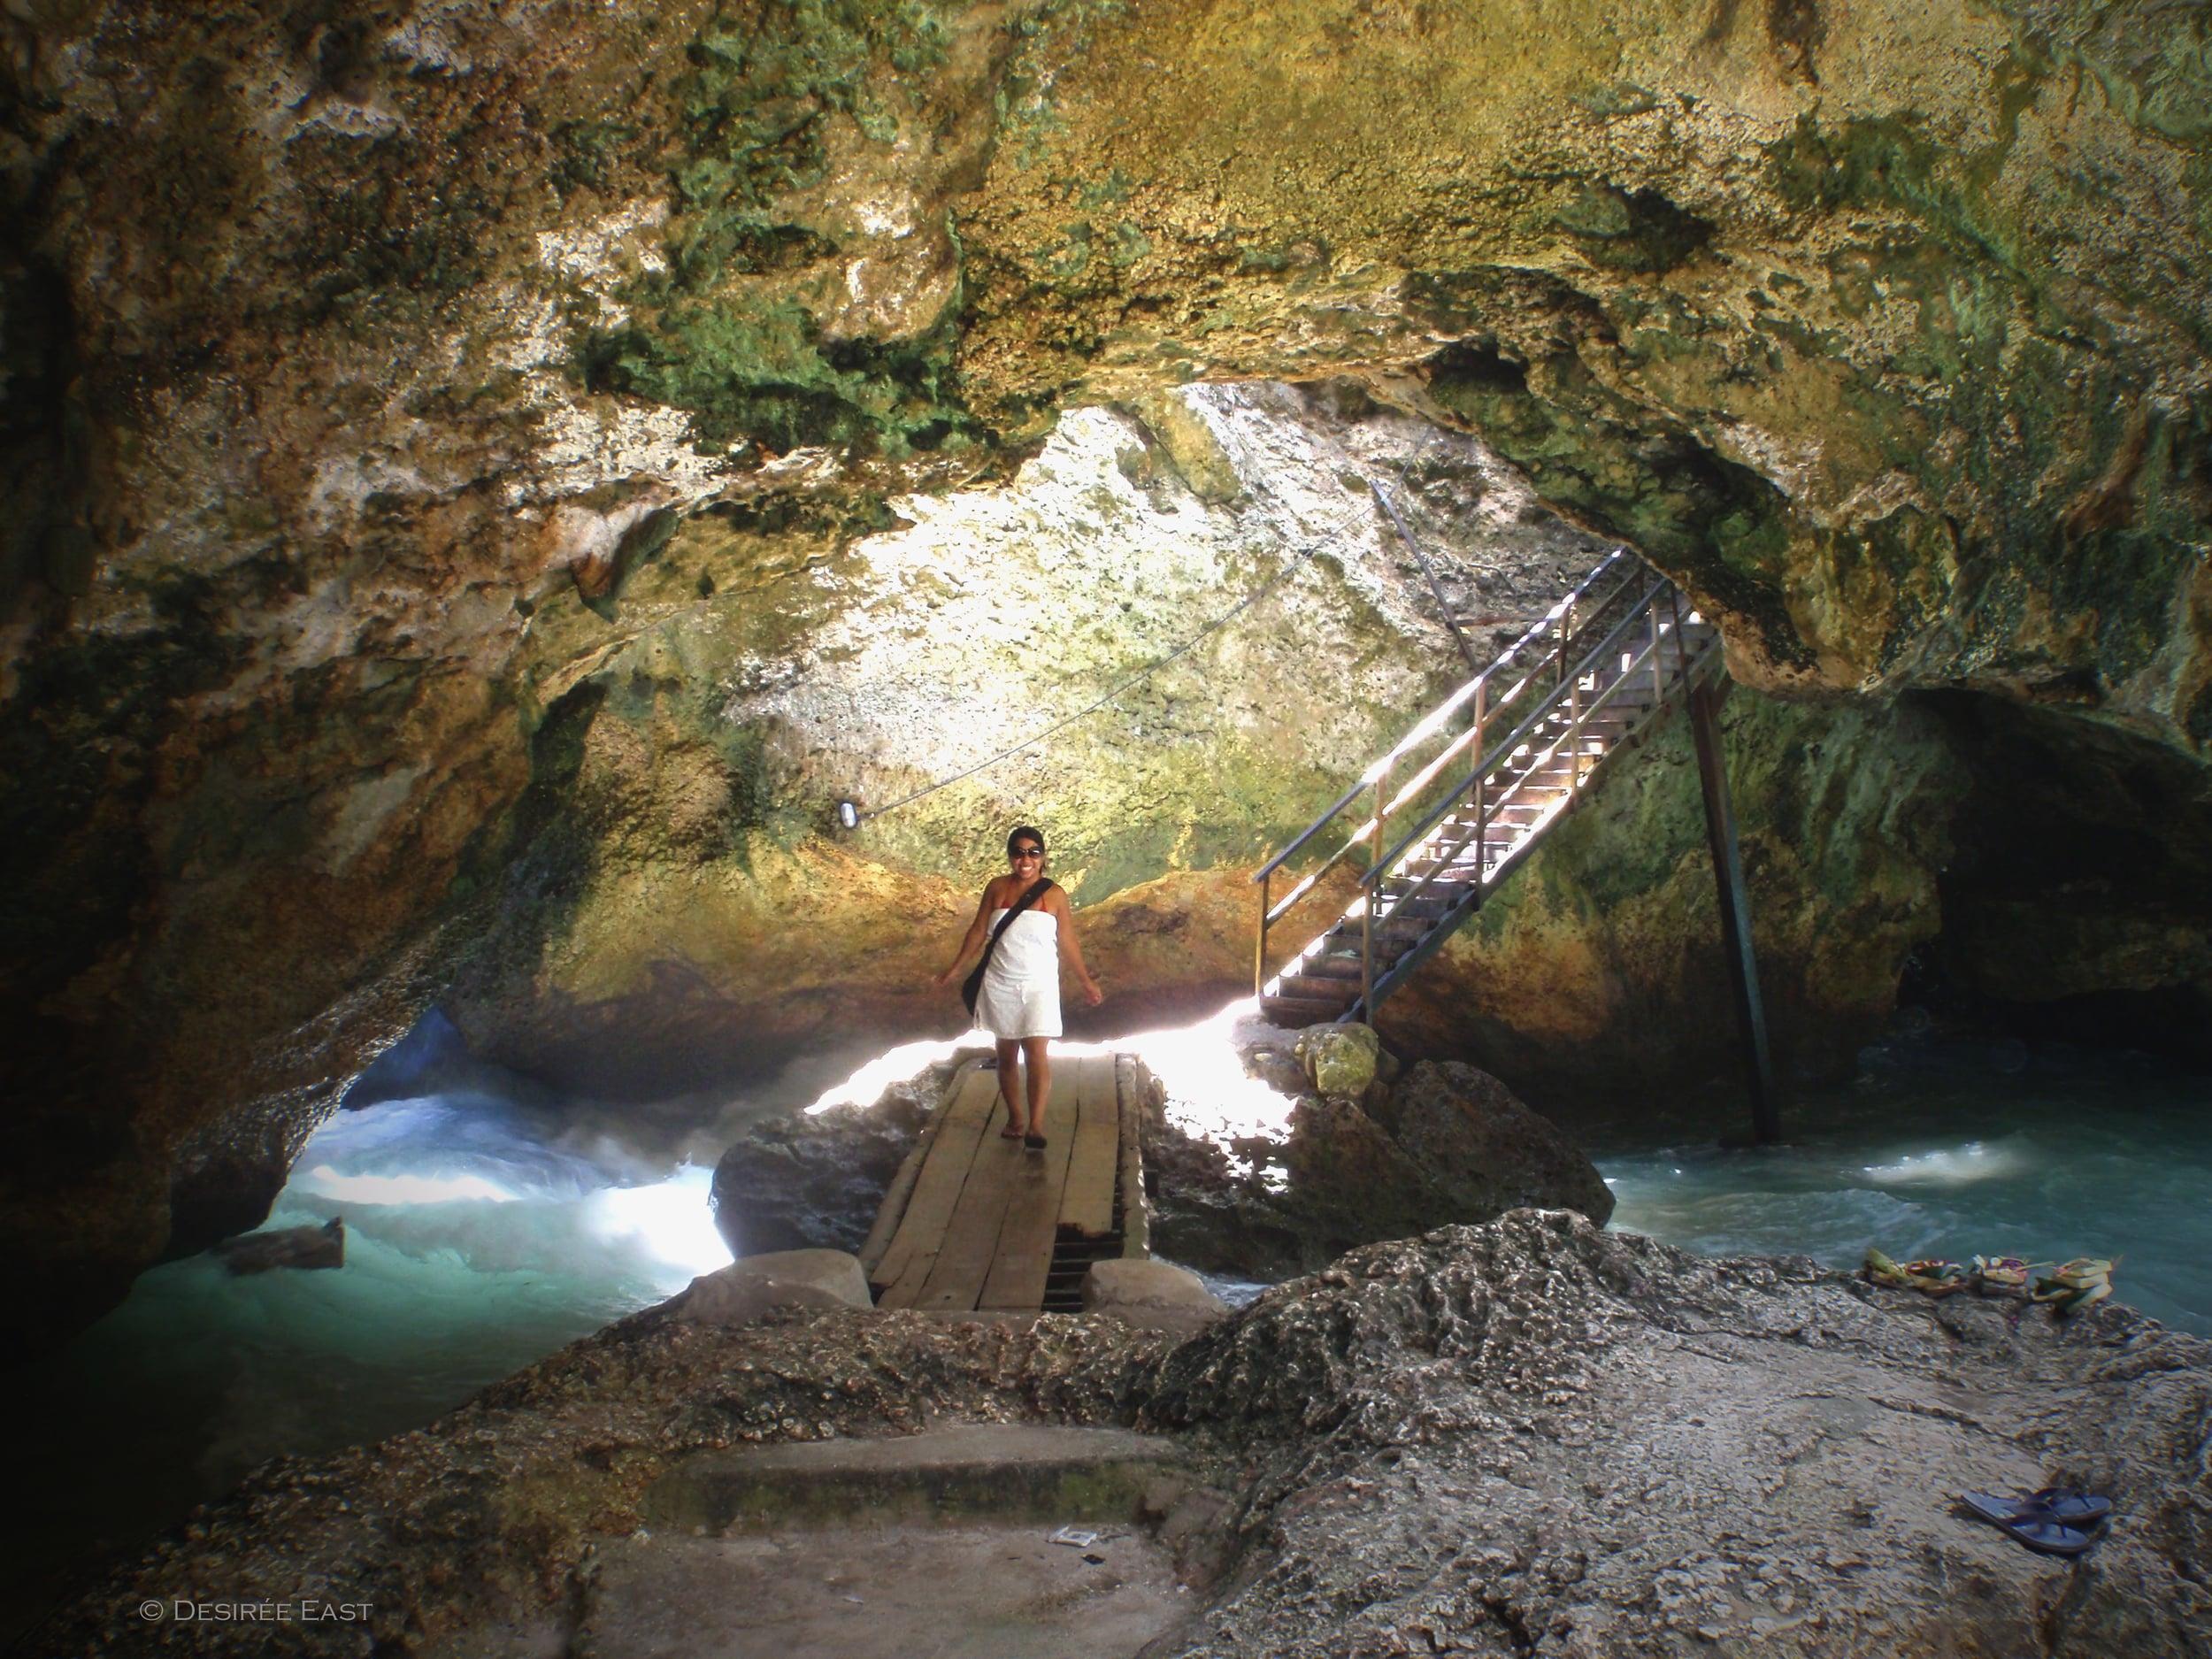 loving the adventure. sea cave at uluwatu, bali. desiree east